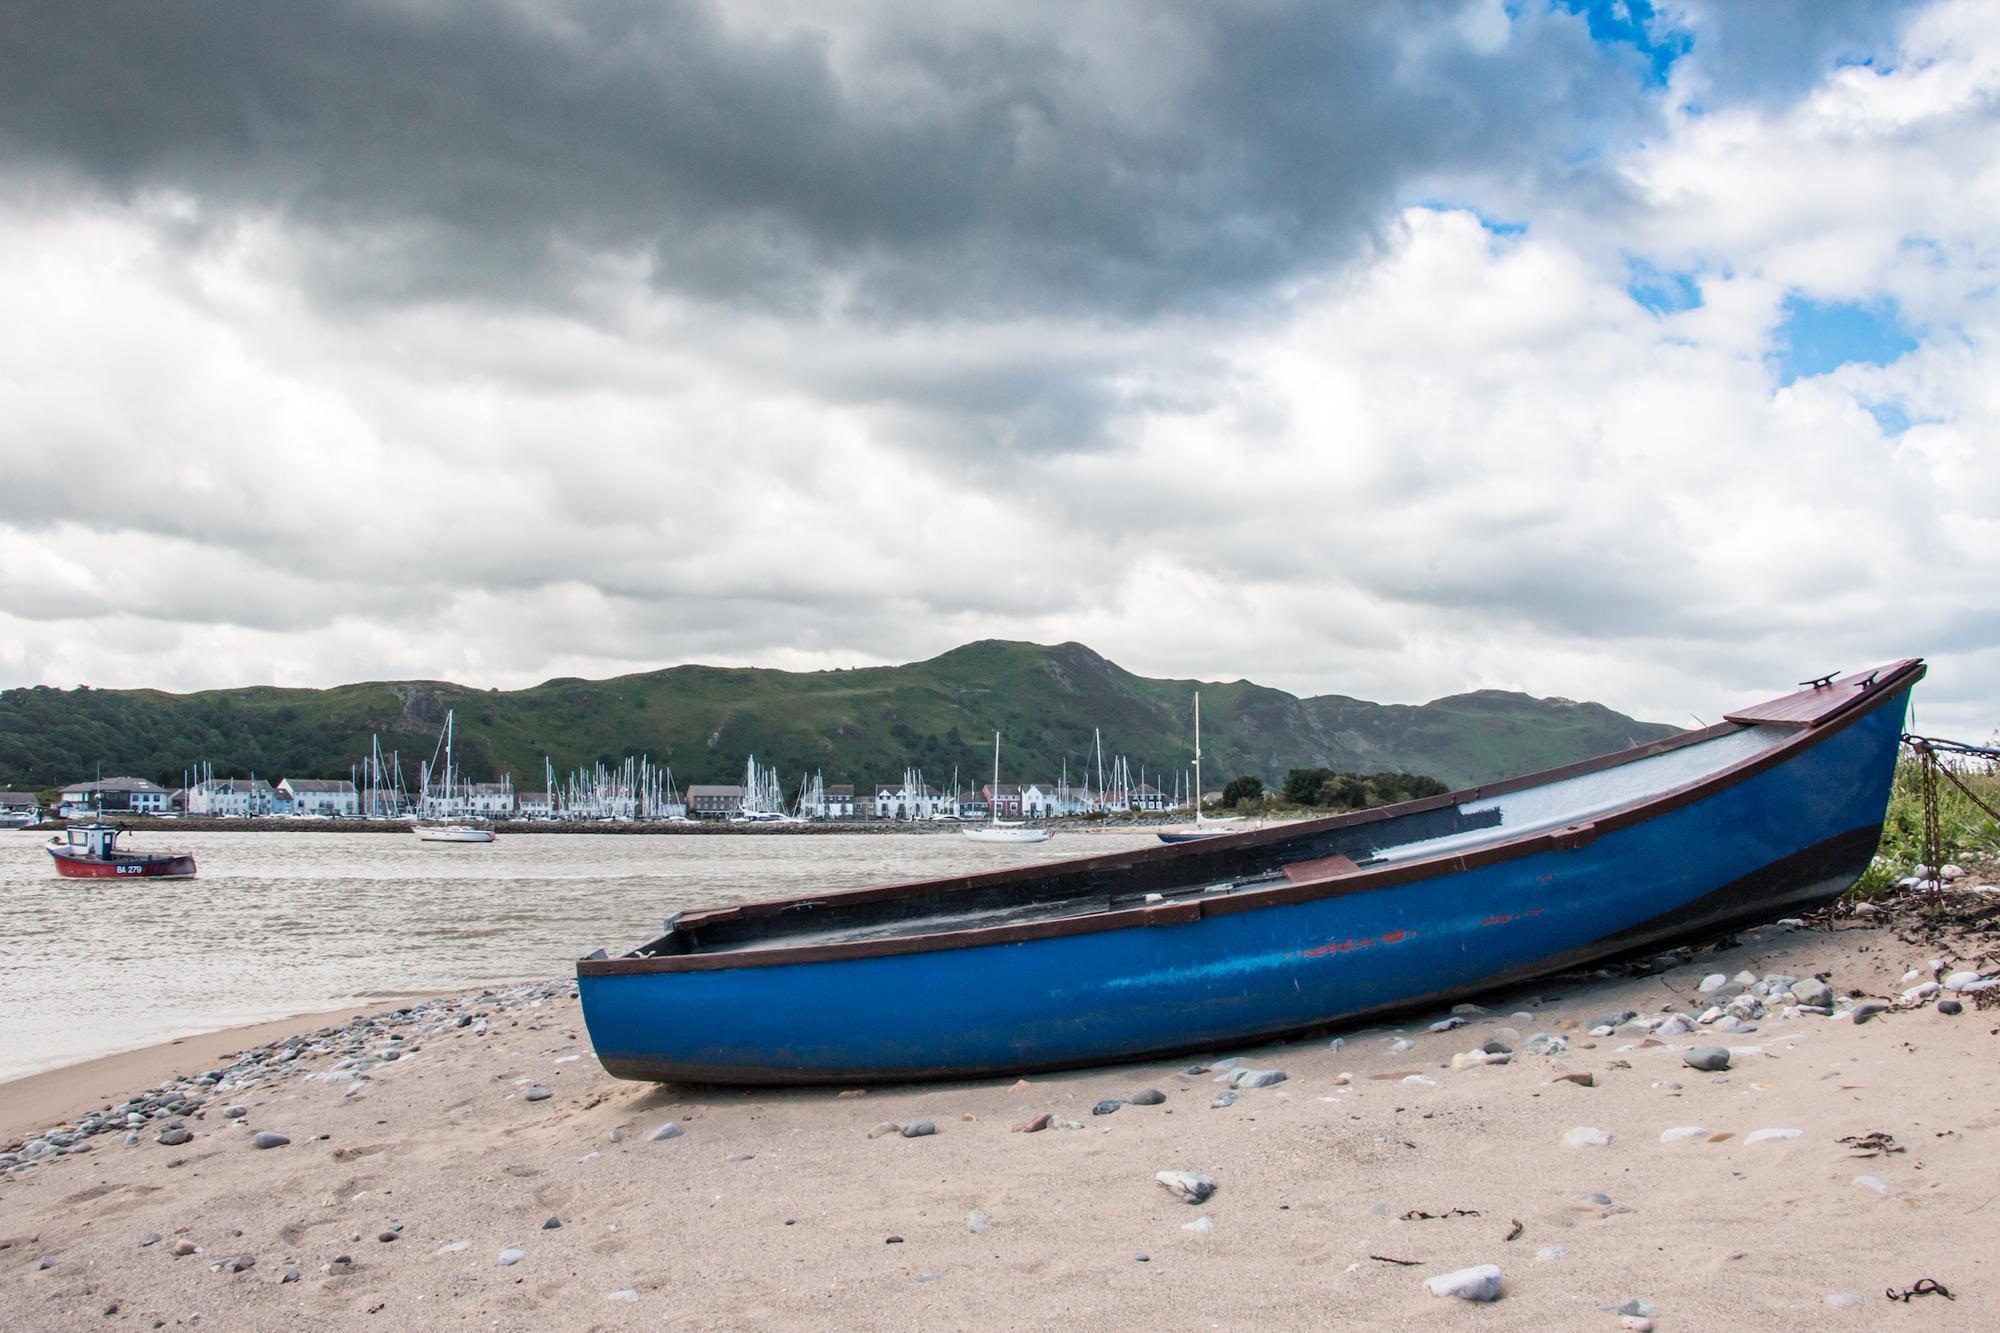 Colwyn Bay Camping | Campsites in Colwyn Bay, North Wales